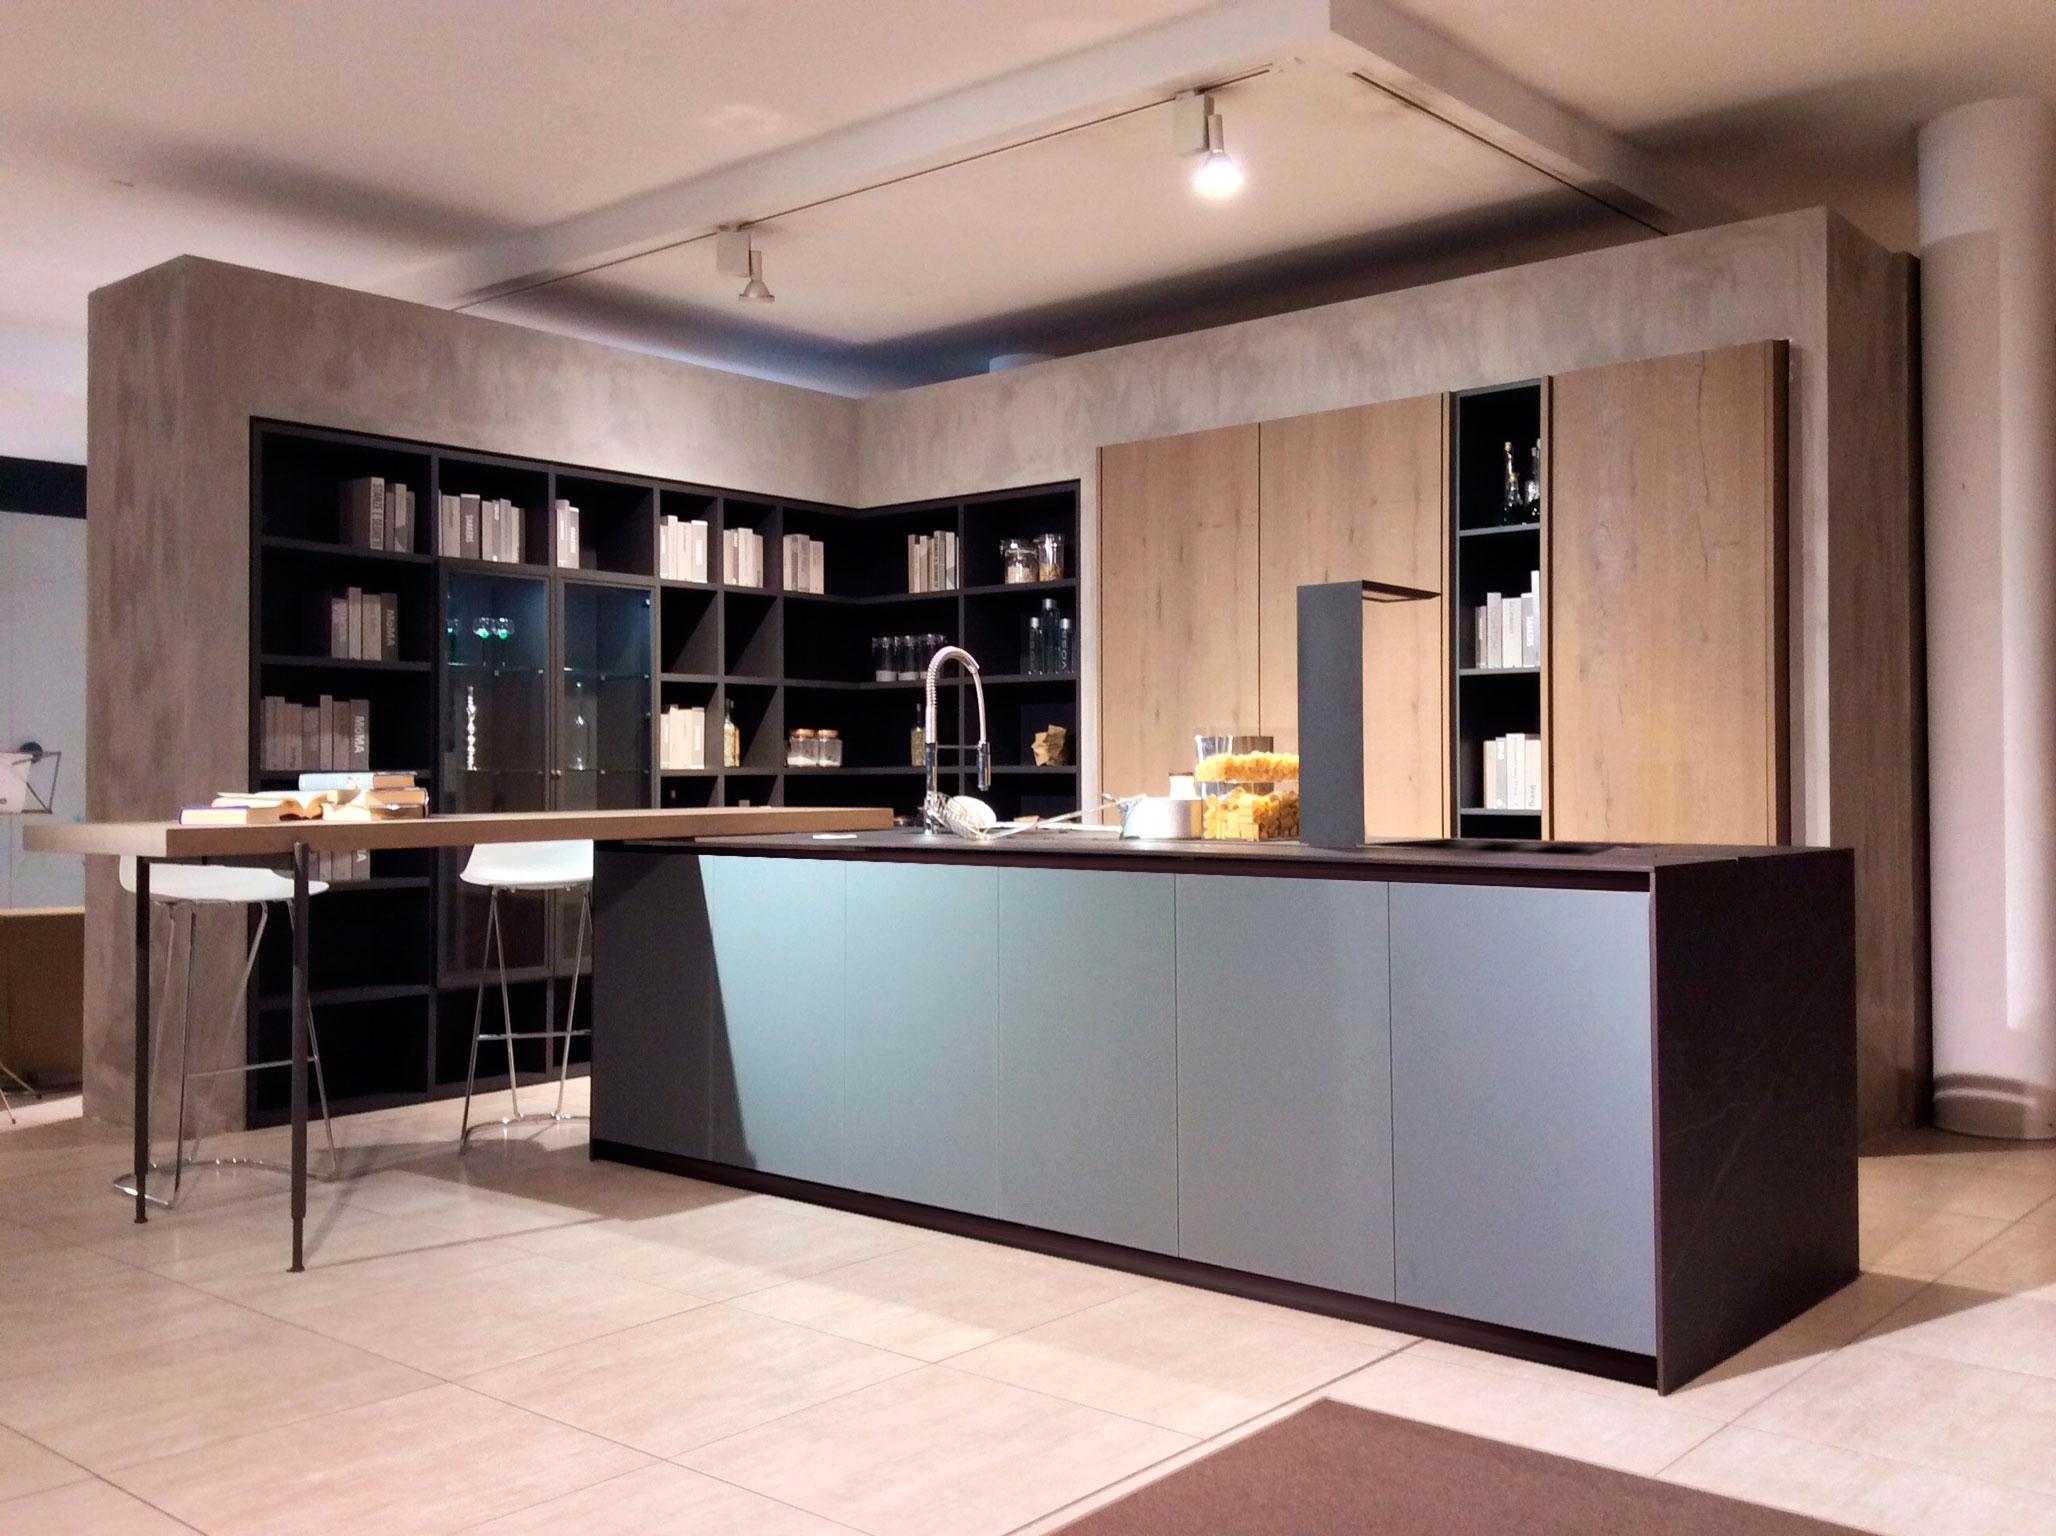 Stunning Arrital Cucine Catalogo Images - acrylicgiftware.us ...